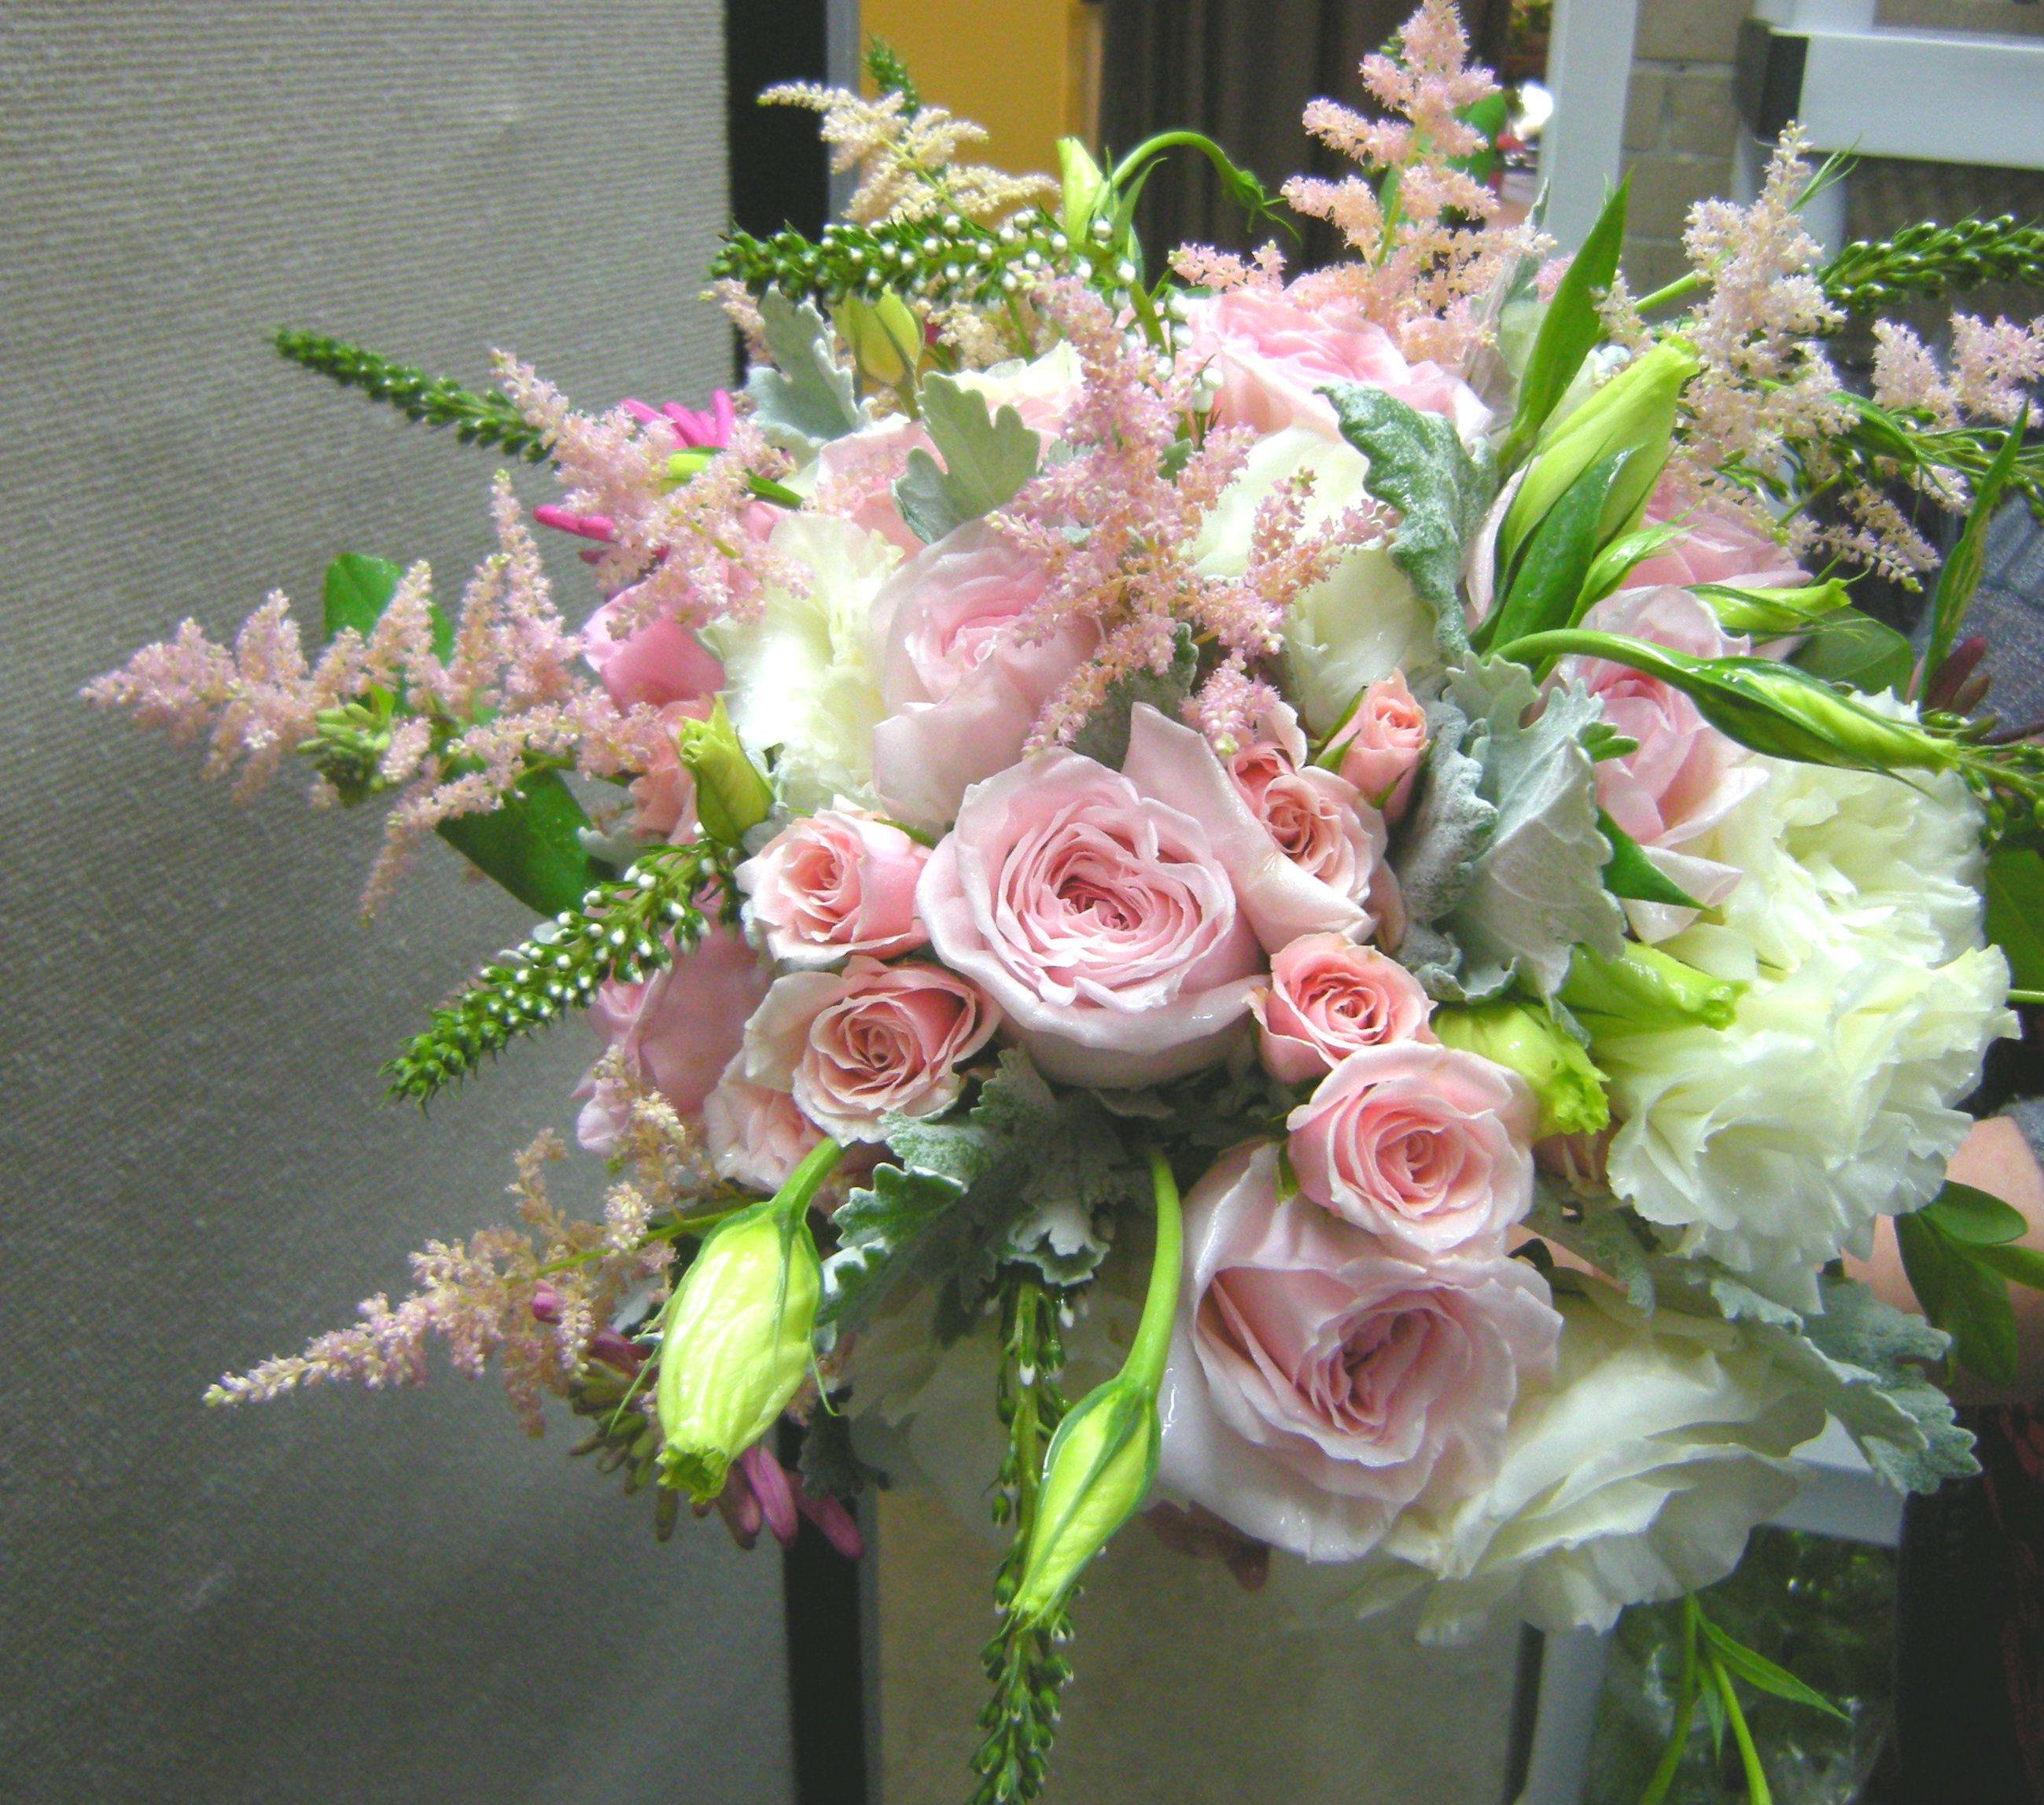 Hixson FTD florist Hixson, TN, 37343 Vintage bridal